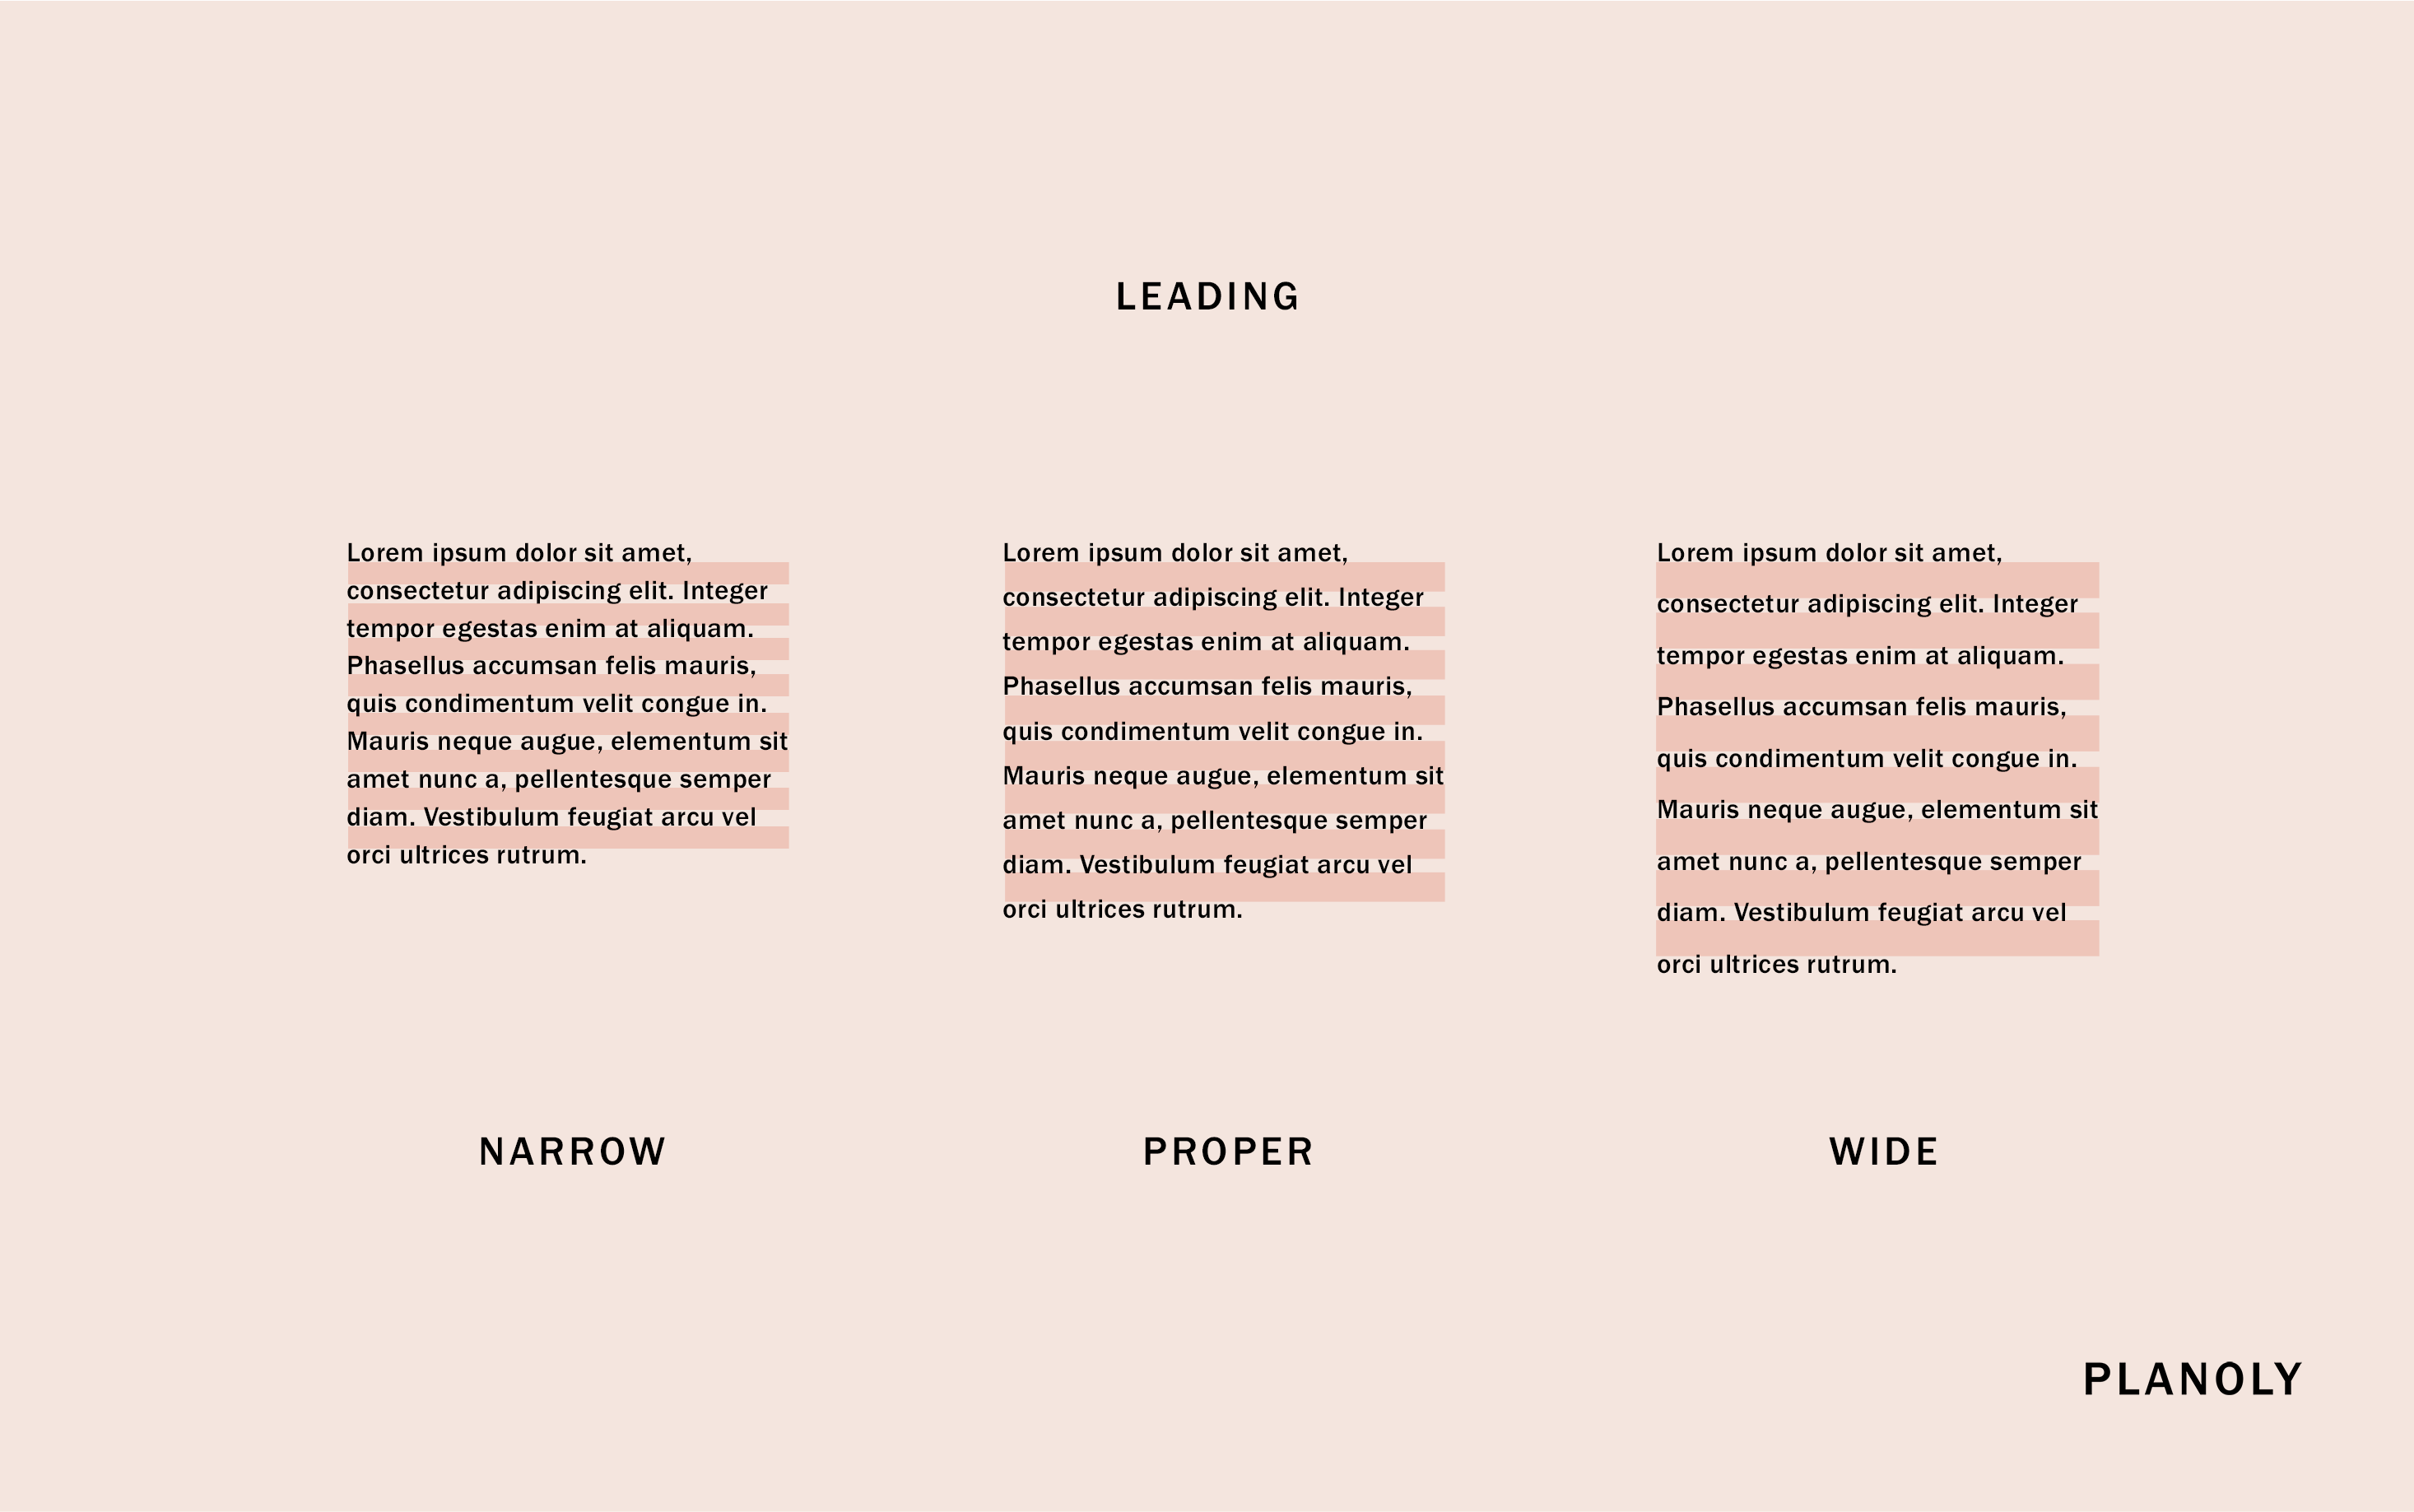 PLANOLY - Blog Post - Typography 101 - Image 5